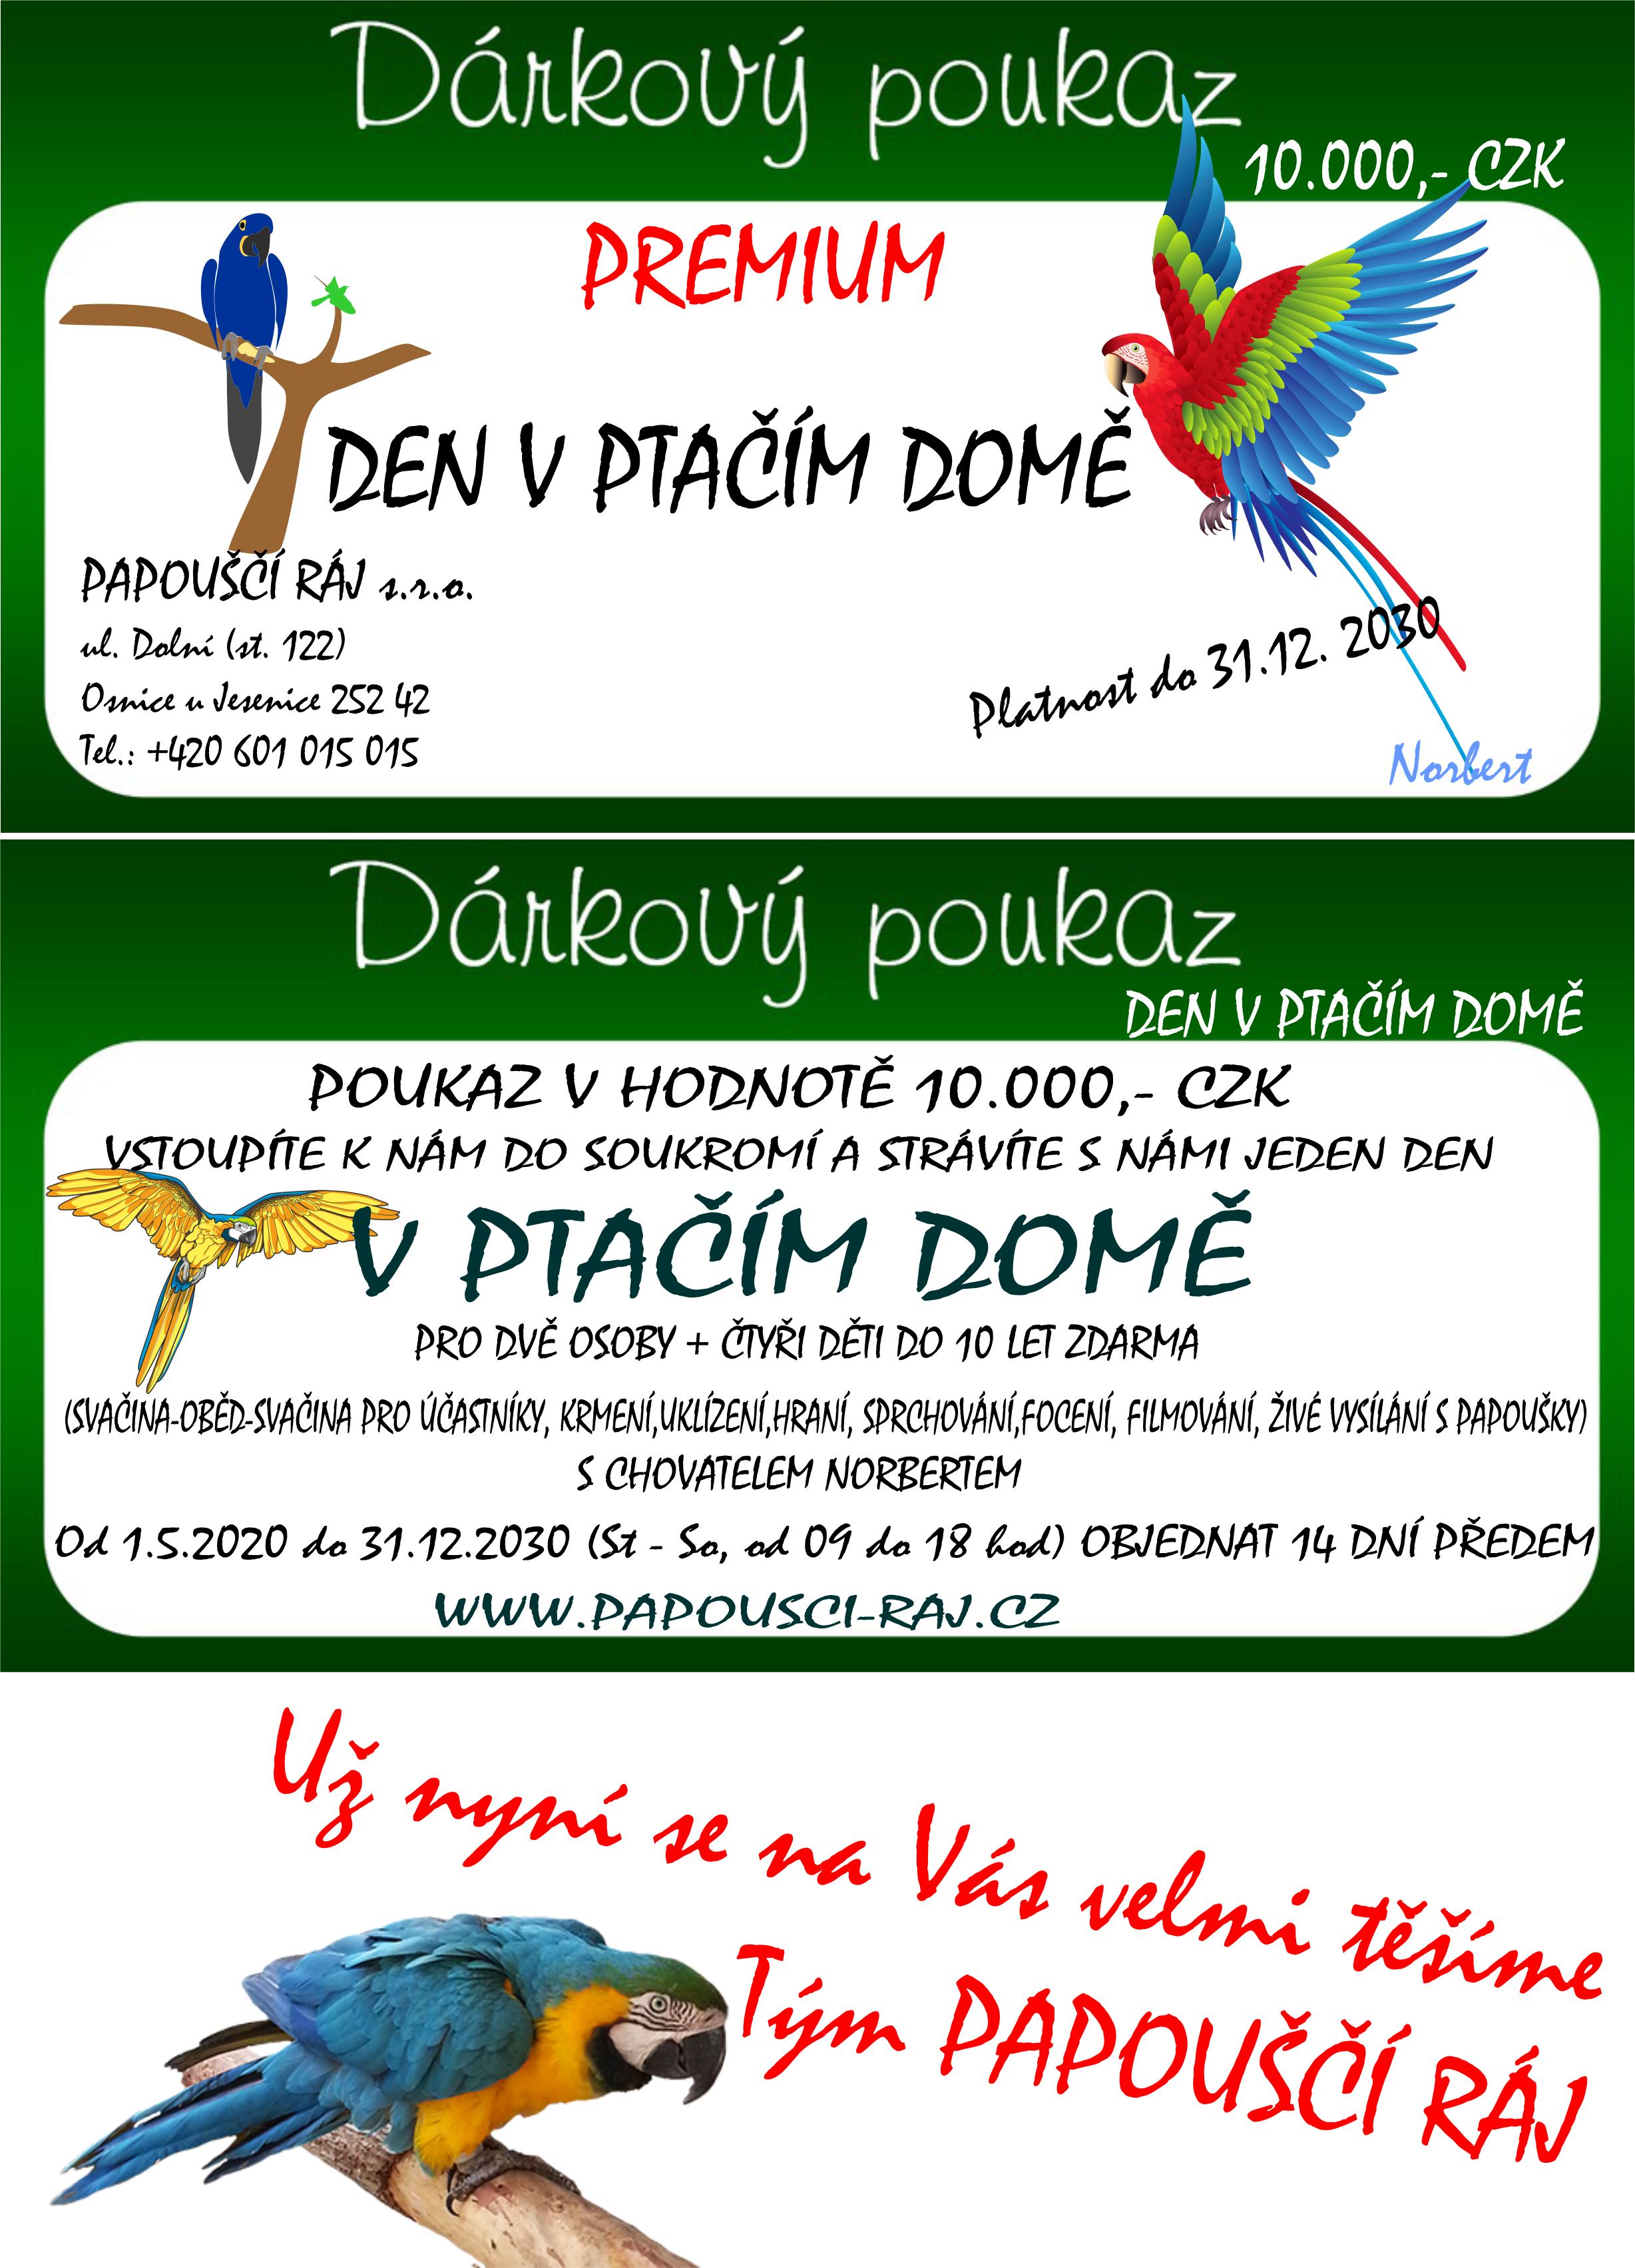 DEN_V_PTACIM_DOME